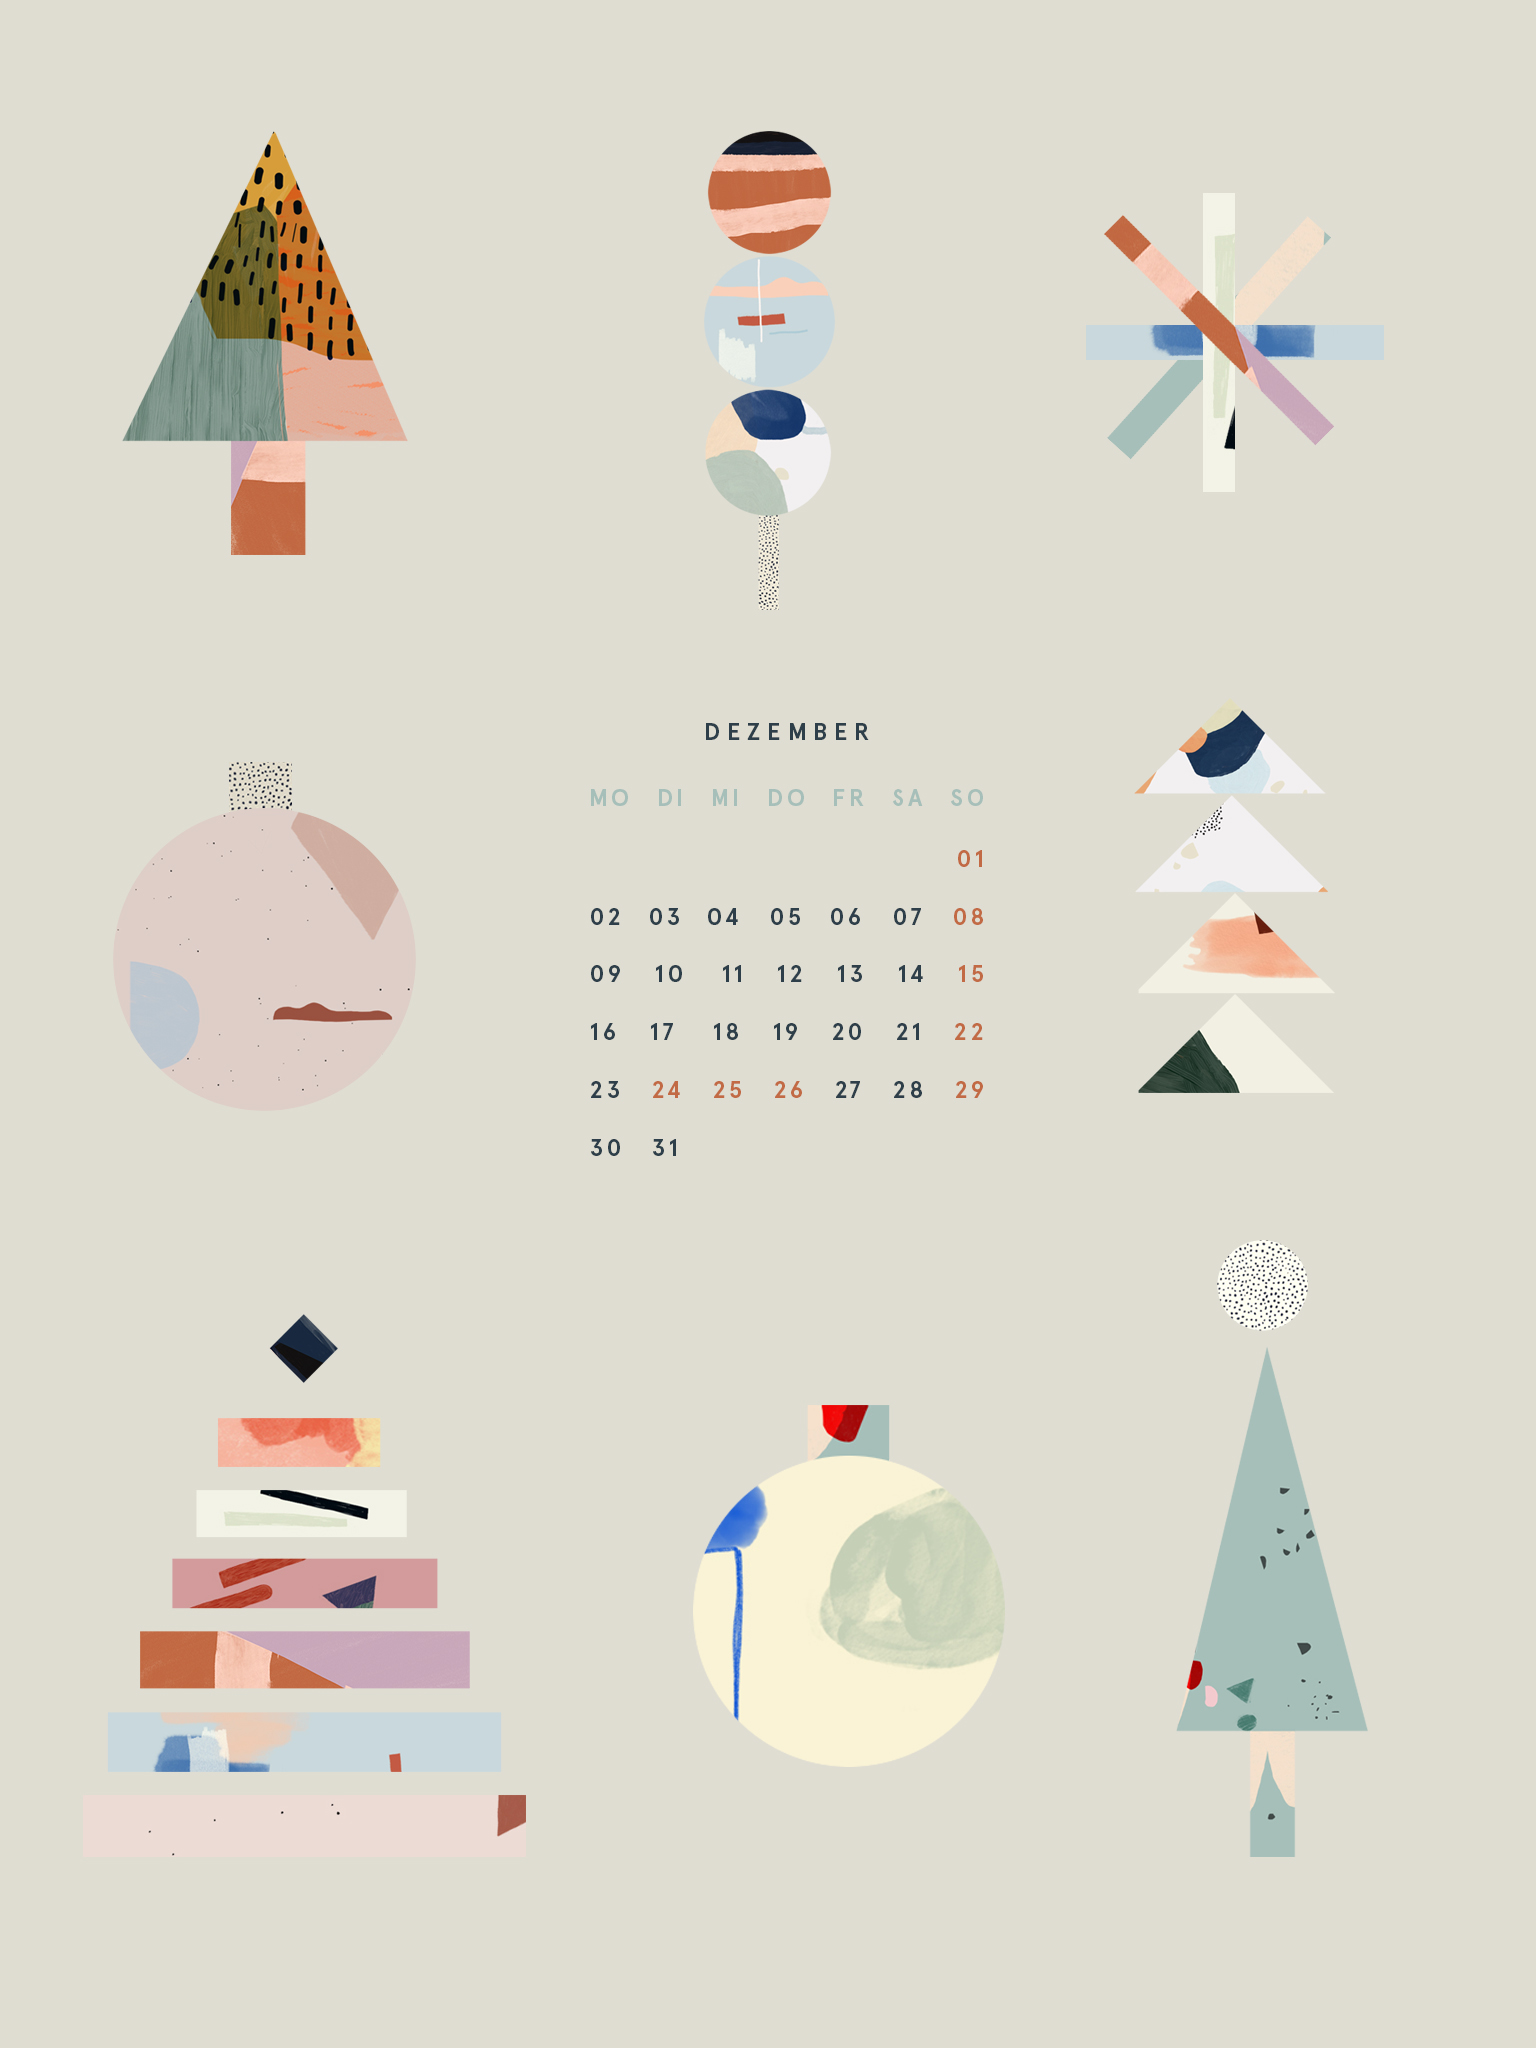 Free Desktop Wallpaper Dezember 2019